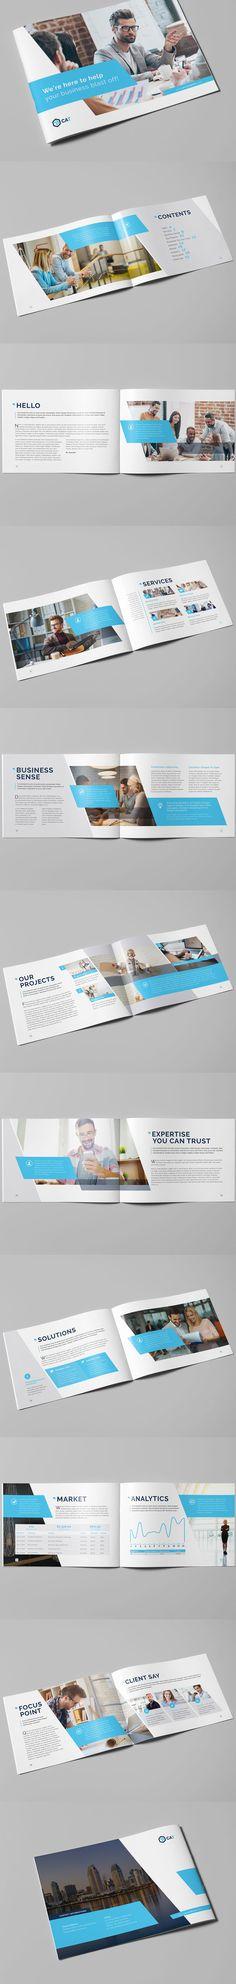 20 Pages Business Brochure - Landscape - Template InDesign INDD